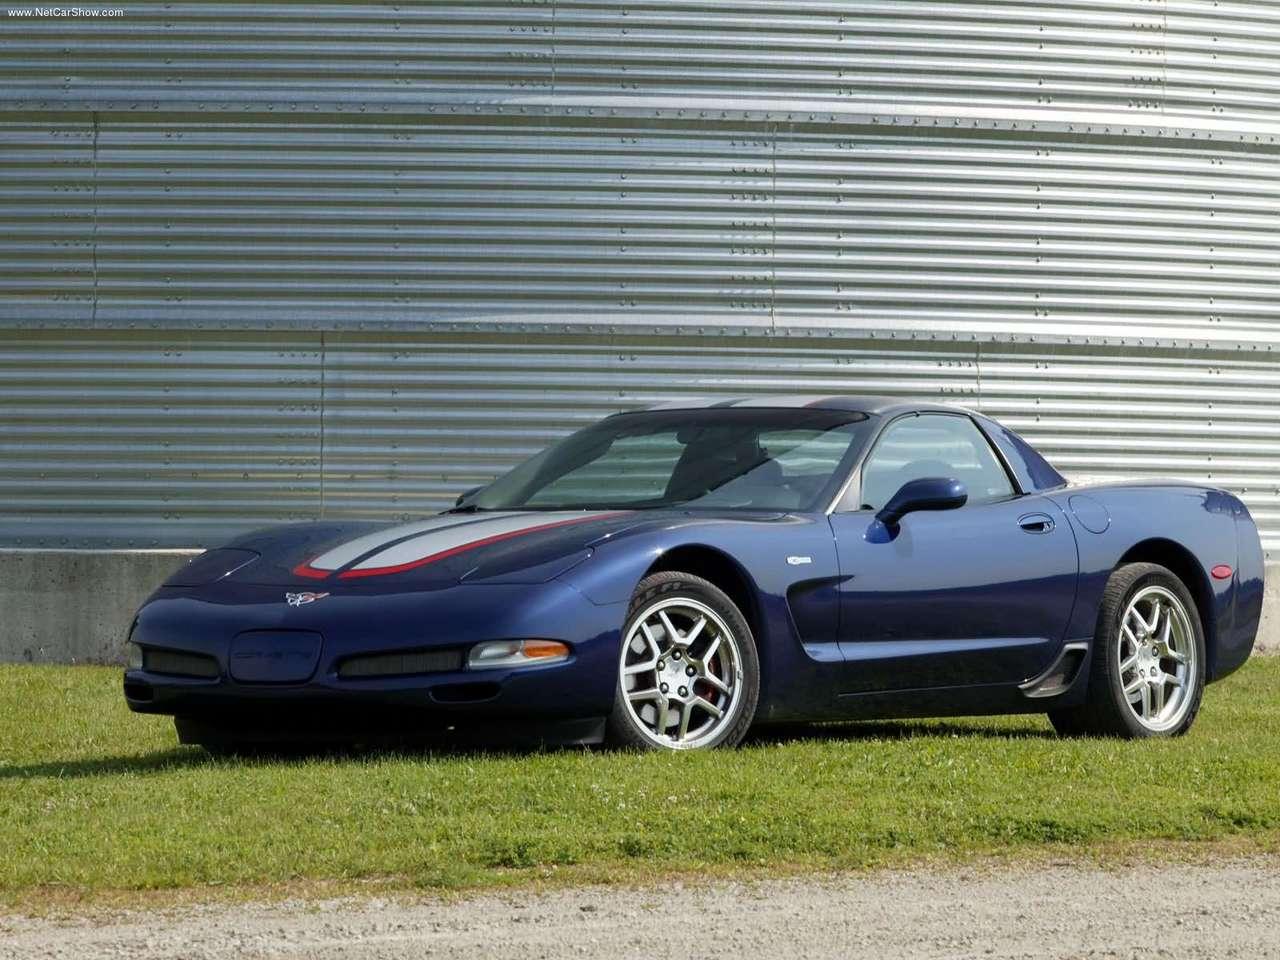 http://4.bp.blogspot.com/-s5Ig6VscZFo/TYCRjRKsGMI/AAAAAAAANrU/MBM5buk85KQ/s1600/Chevrolet-Corvette_Z06_Commemorative_Edition_2004_1280x960_wallpaper_03.jpg